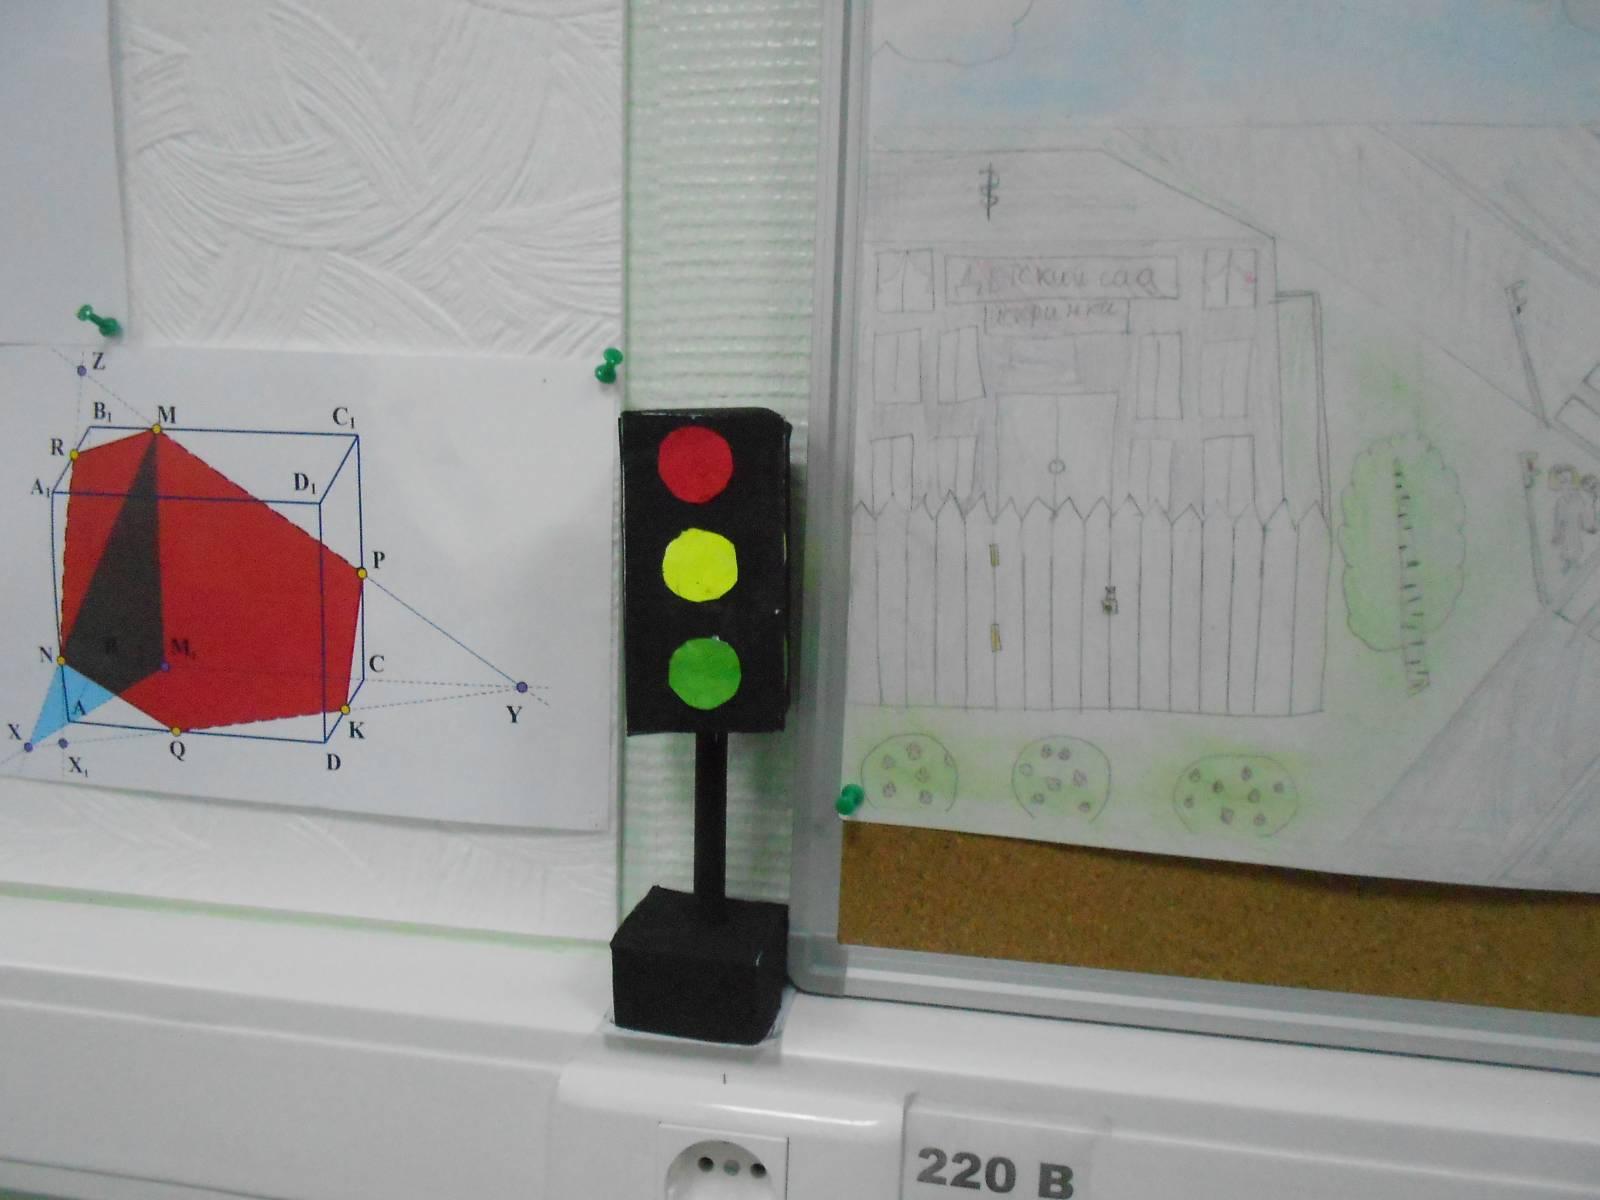 Поделка светофор своими руками - Поделки своими руками 73